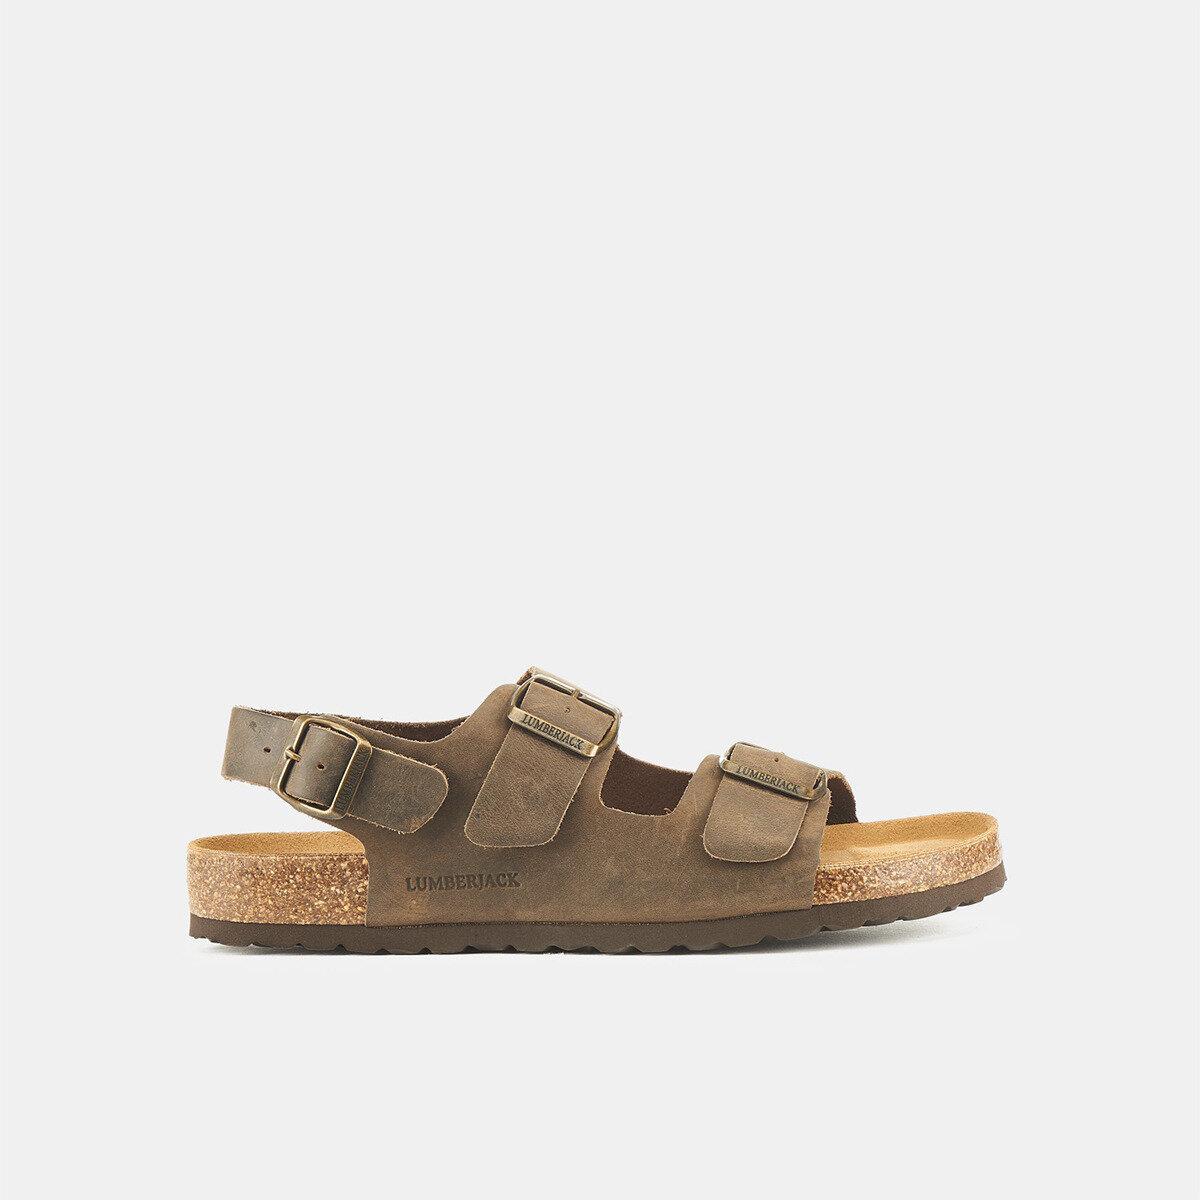 ISLA DK BROWN Man Sandals